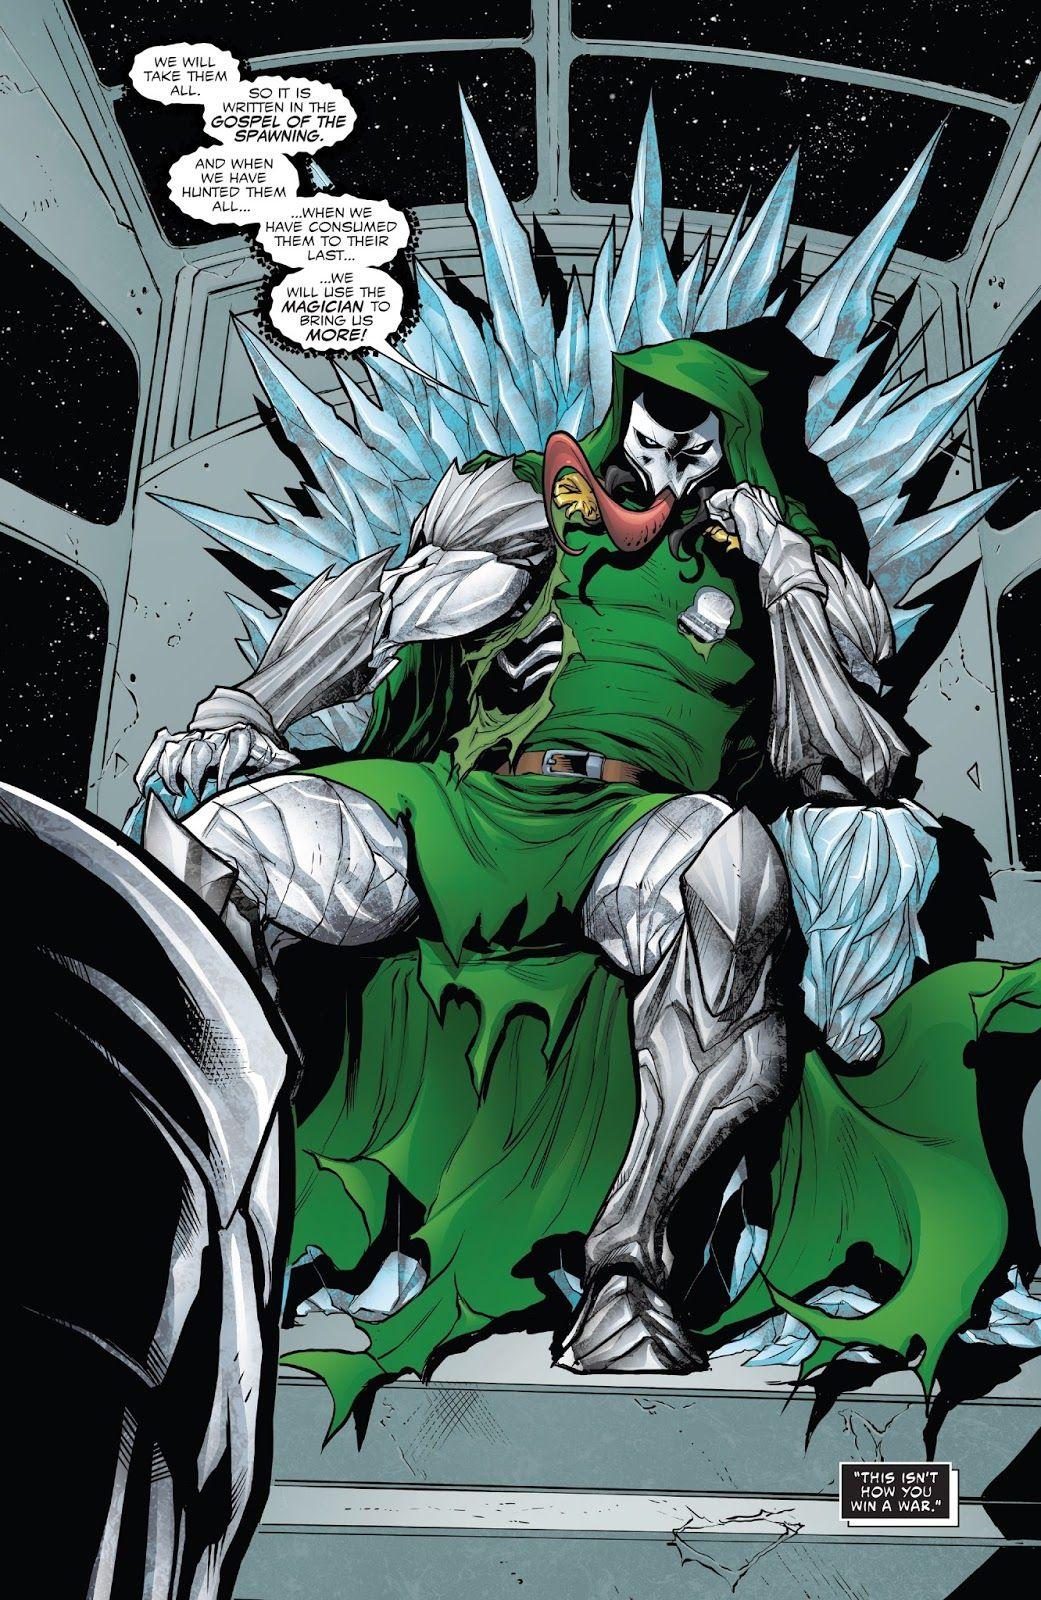 venomverse issue 2 read venomverse issue 2 comic online in high